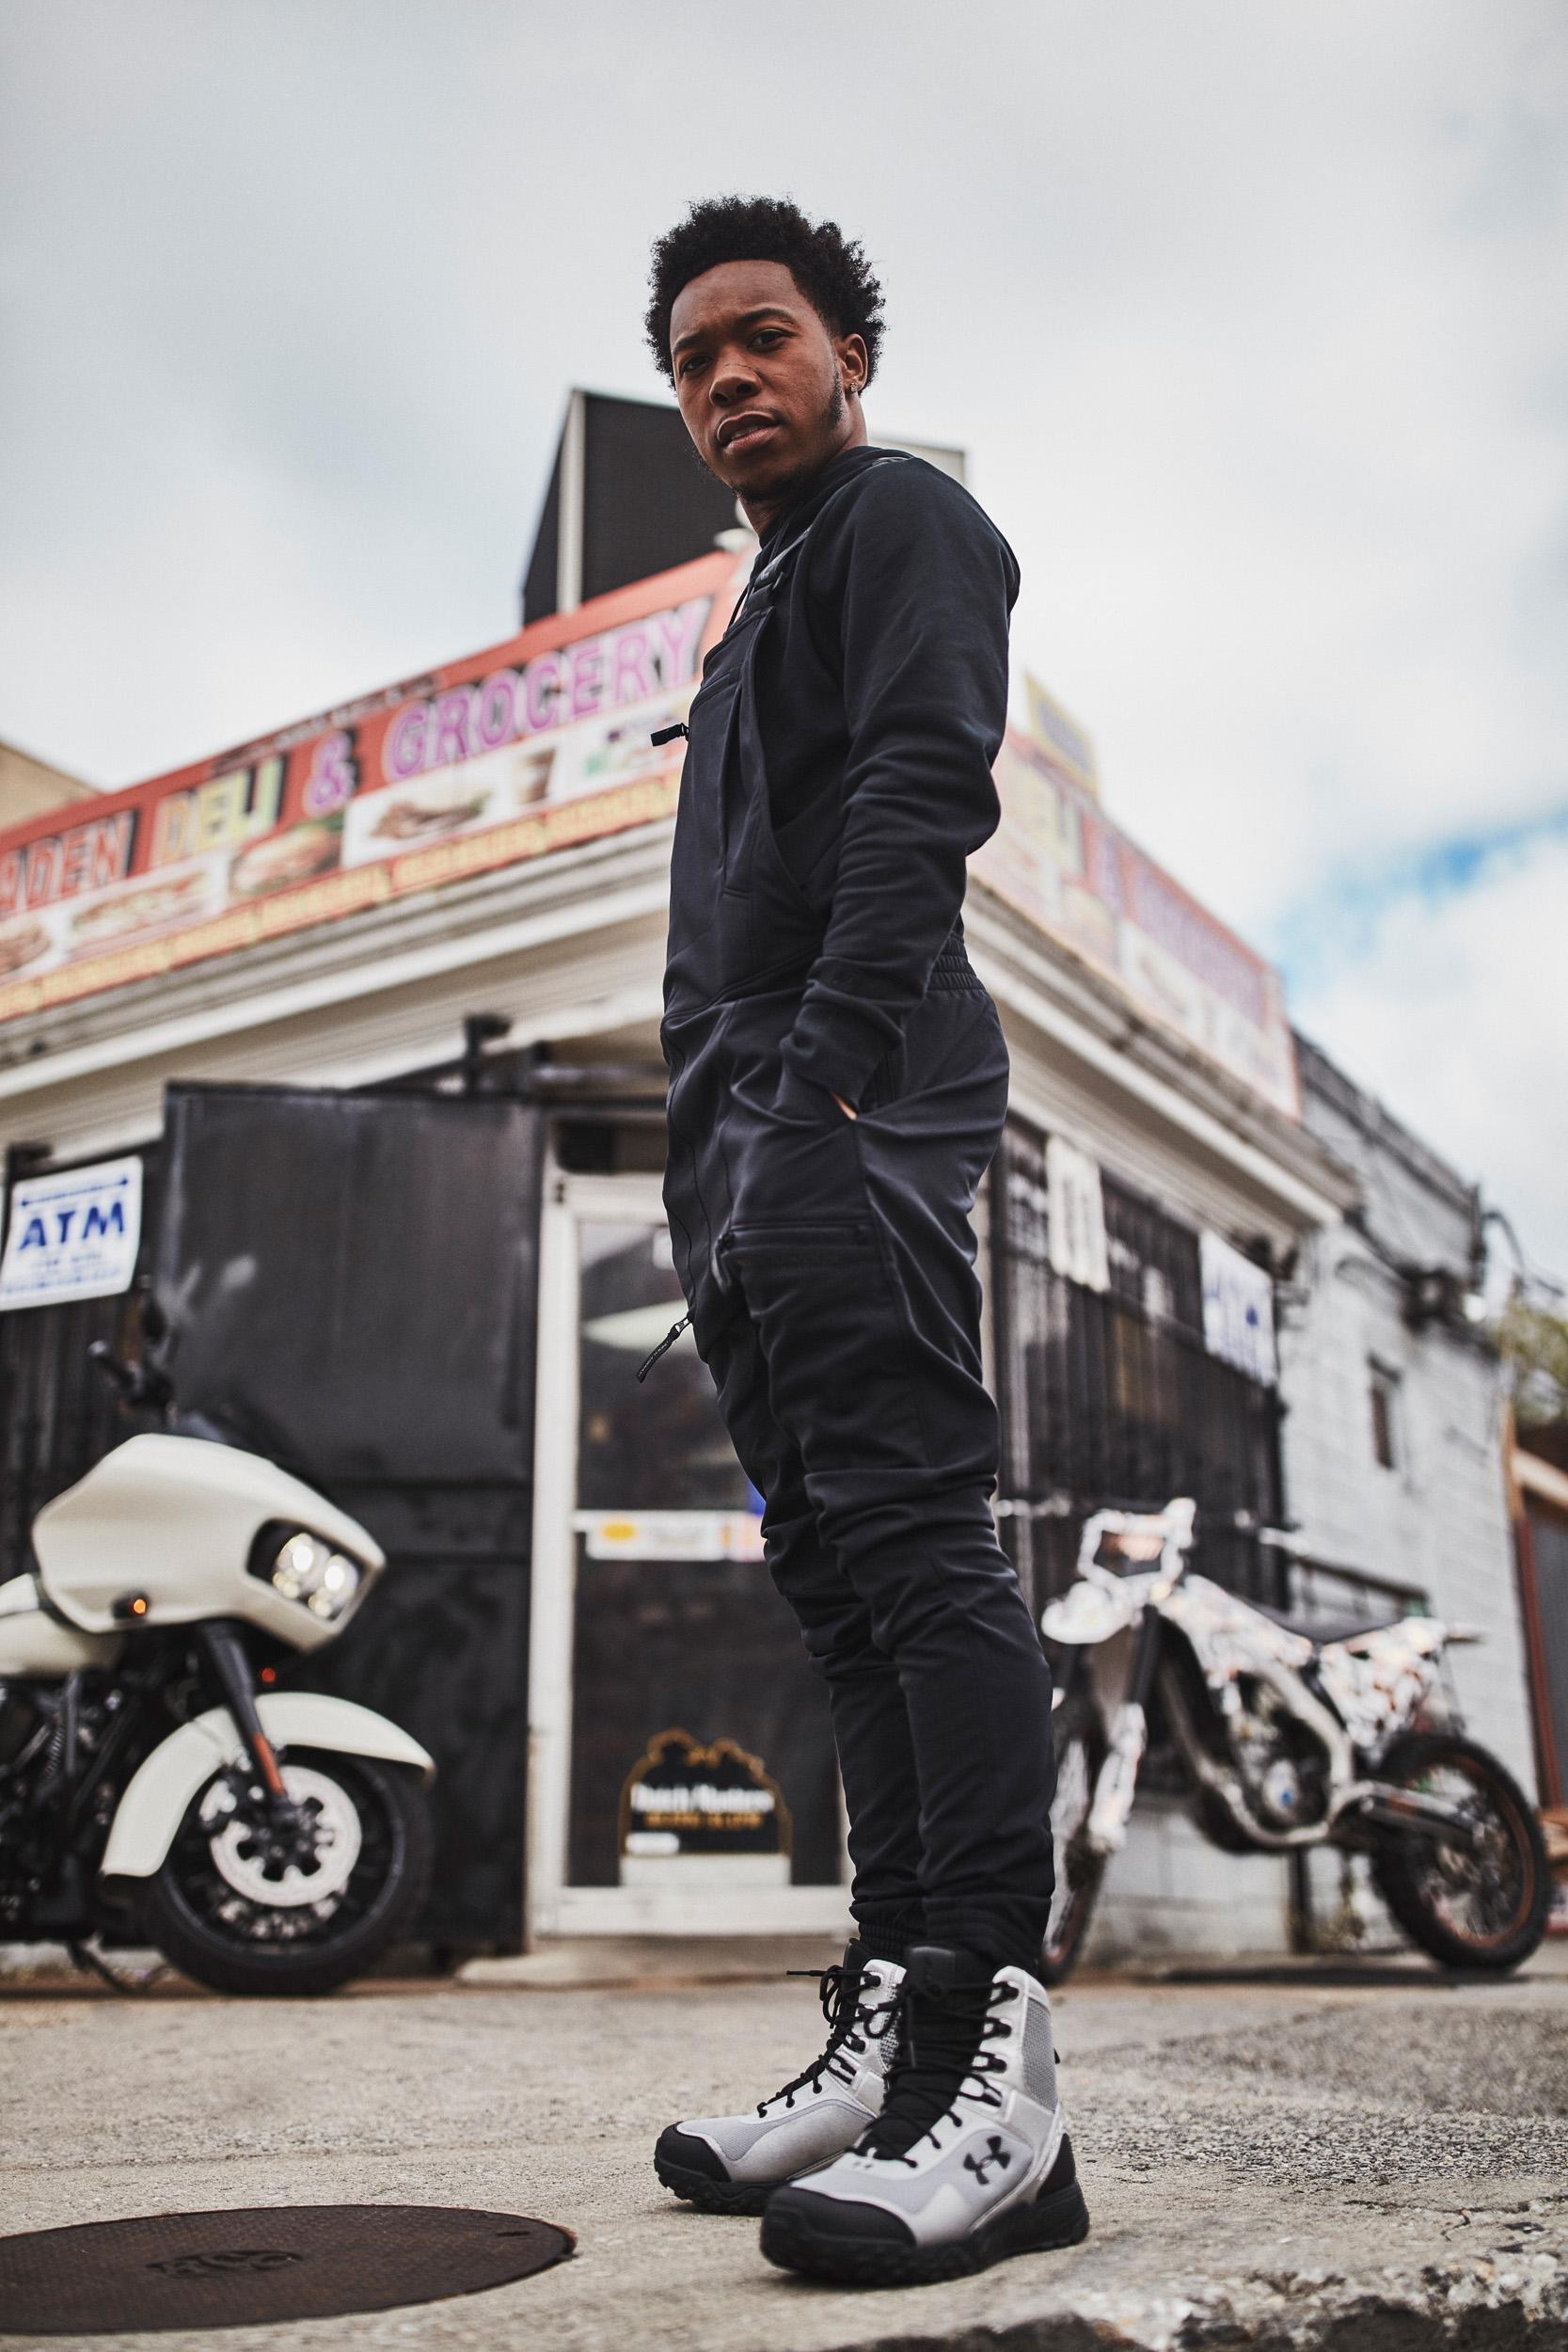 Chino Braxton, Baltimore Motocross athlete wearing the UA Pursuit bib